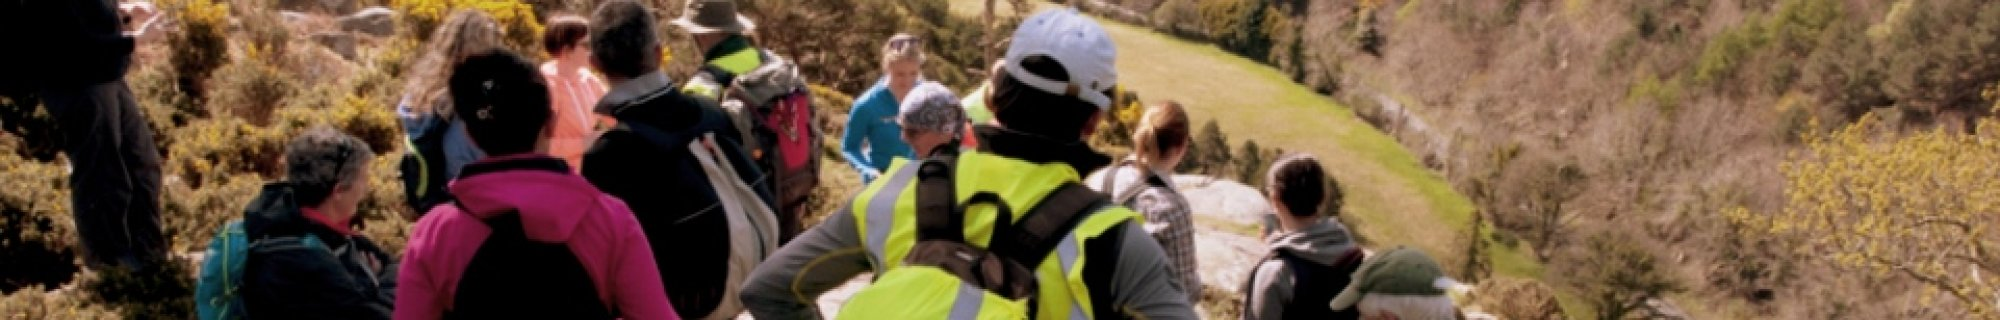 Image from Dublin Mountains Partnership Walk